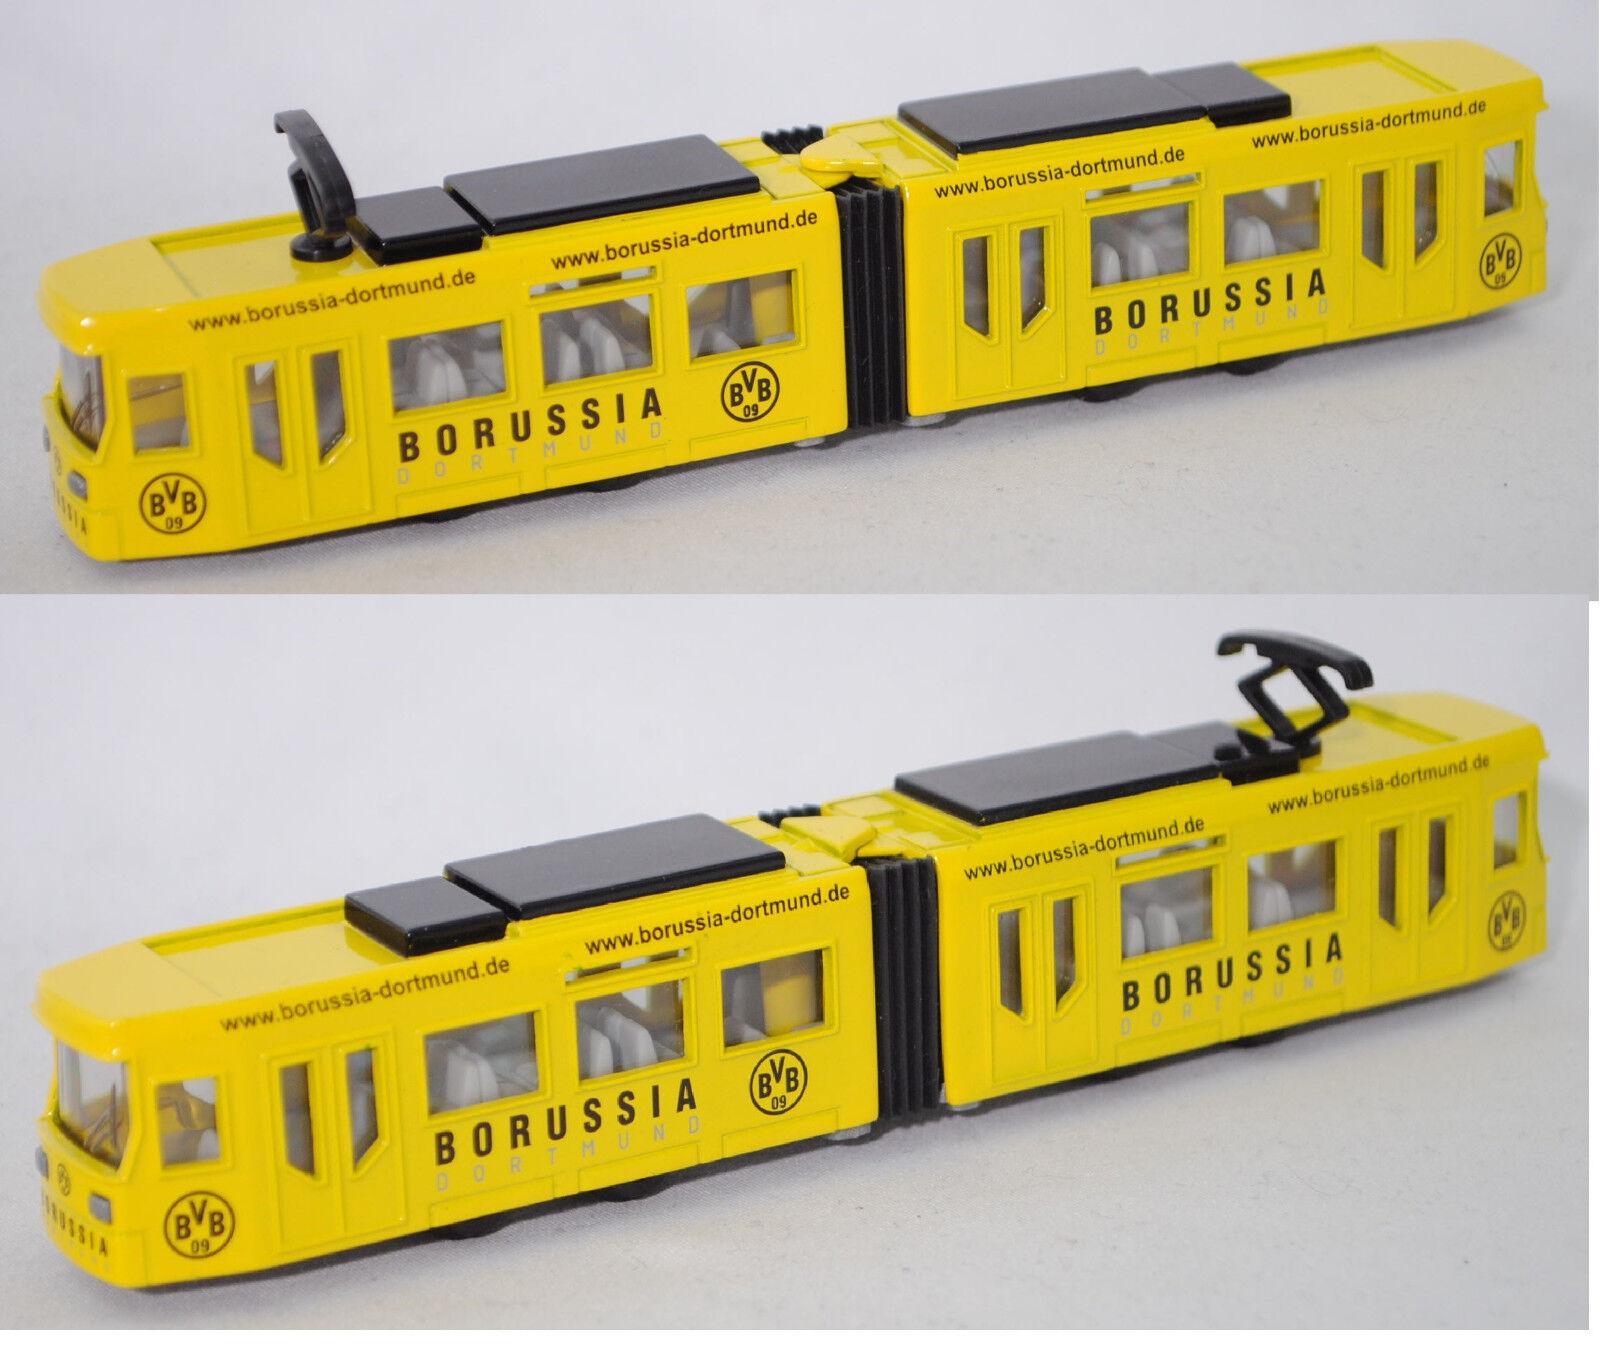 Siku Super 1615 00401 bombardier tranvía, borussia-dortmund, werbemodell